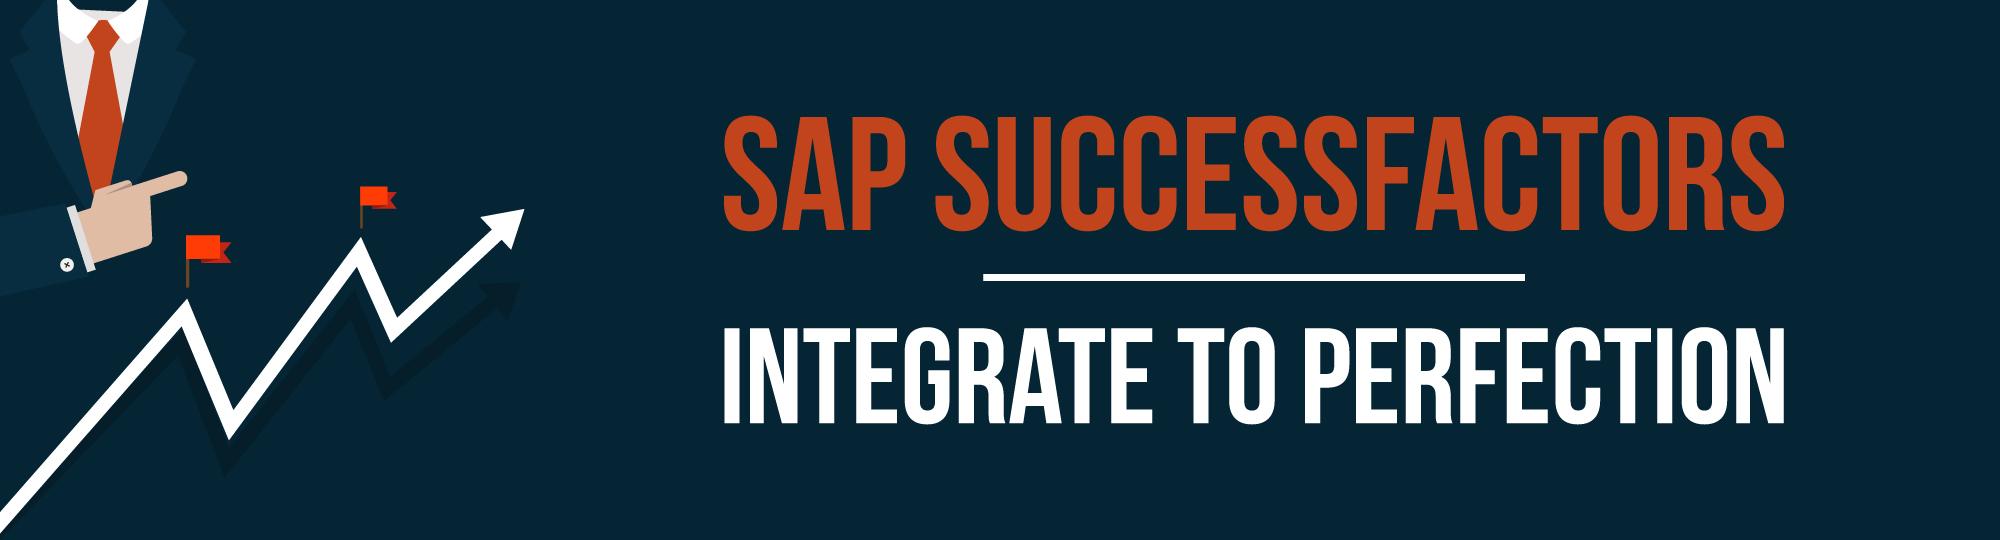 Integrating Success Factors with SAP HCM